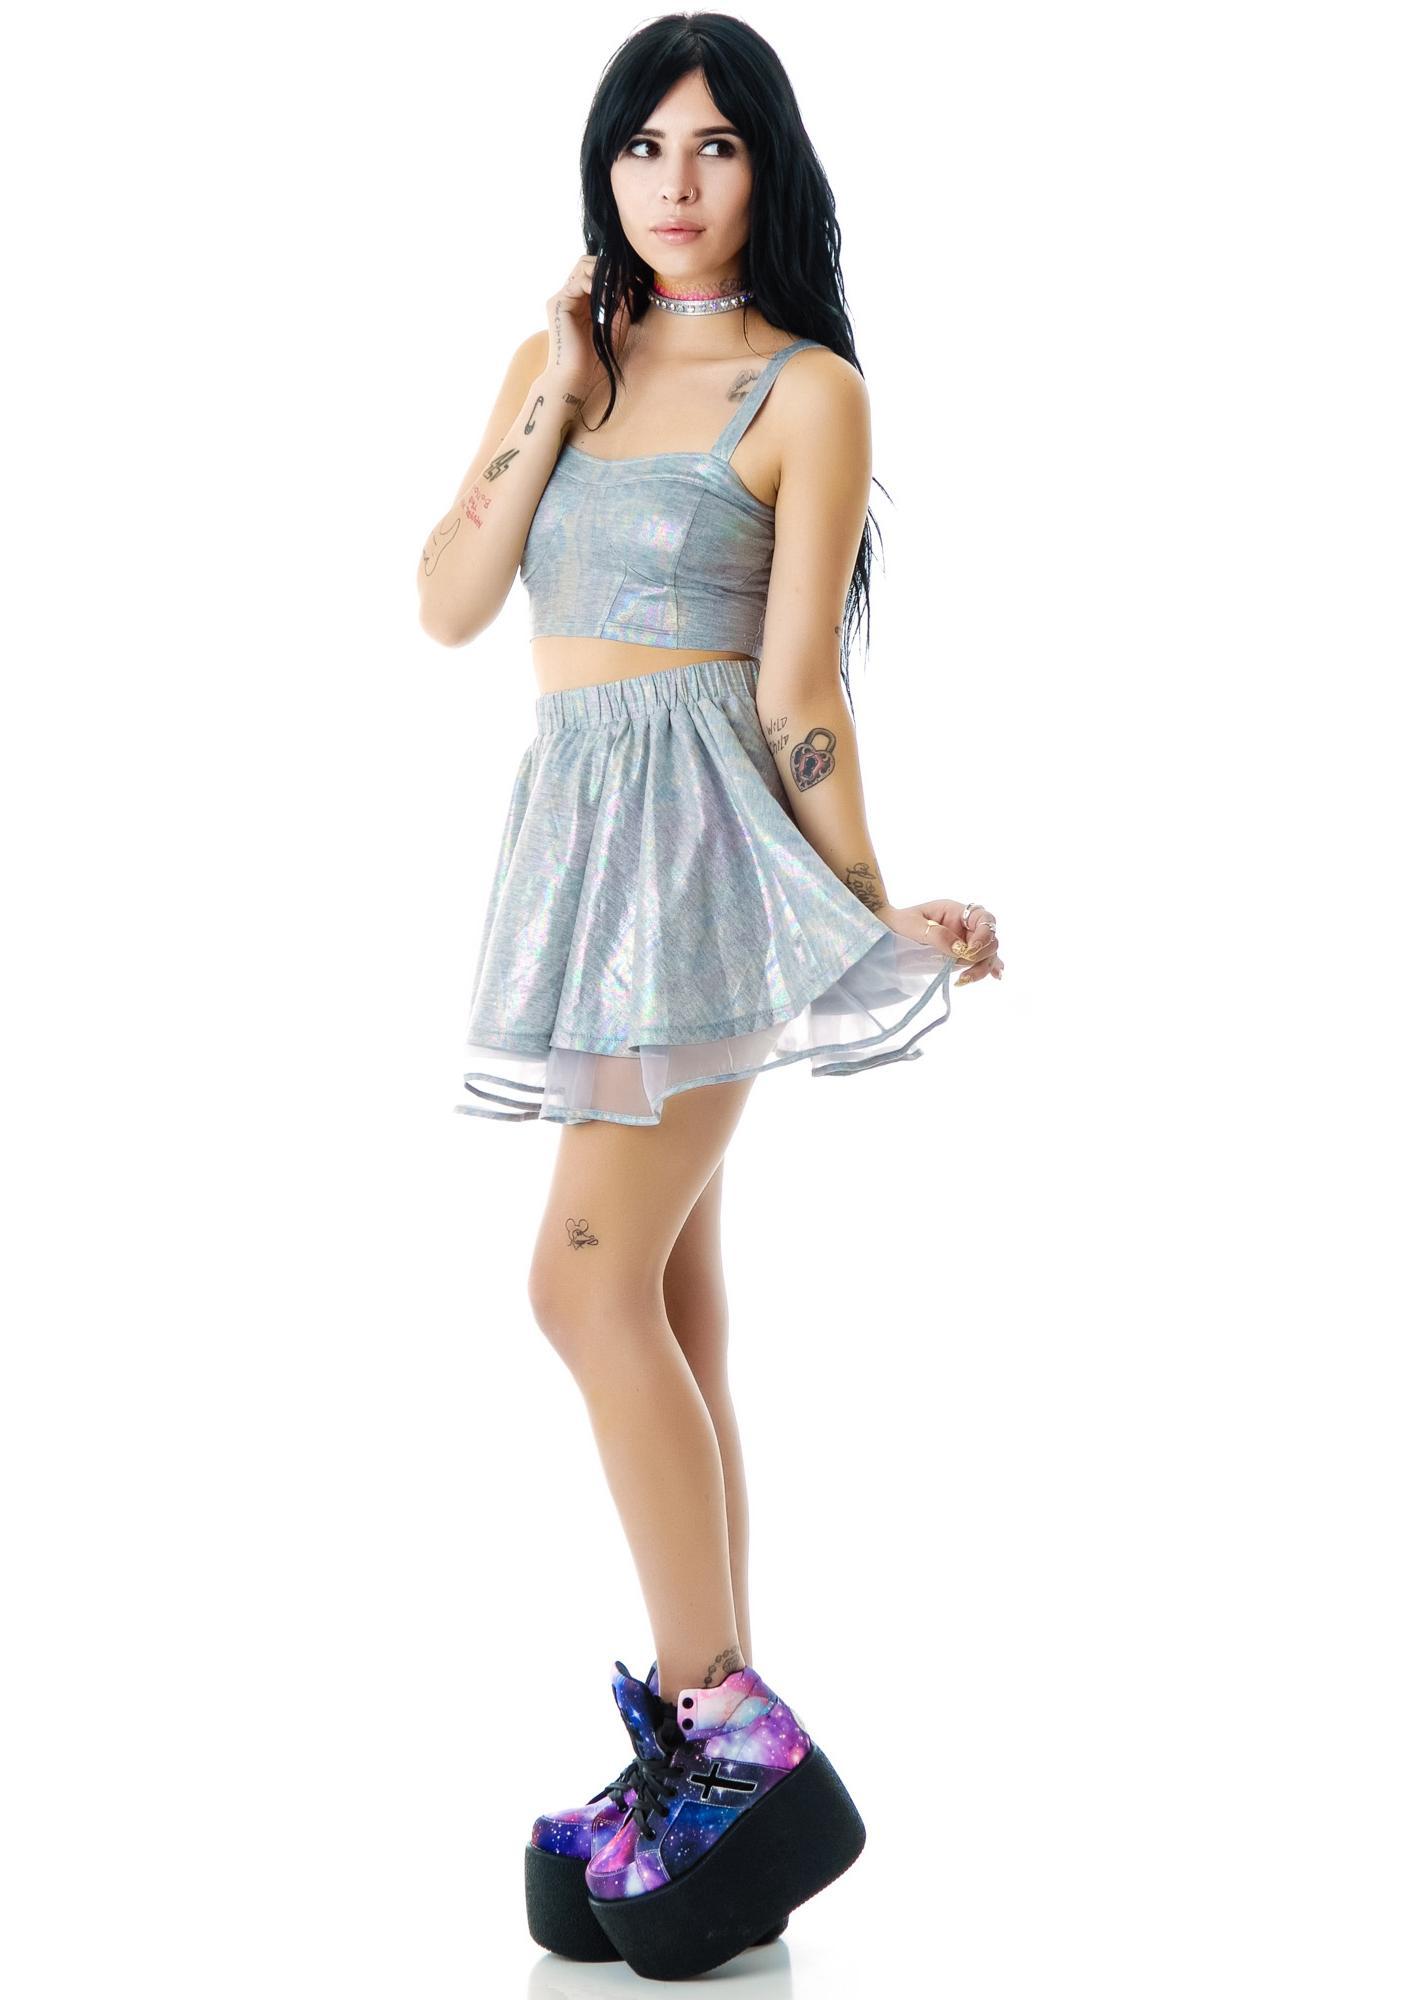 UNIF Spillz Skirt